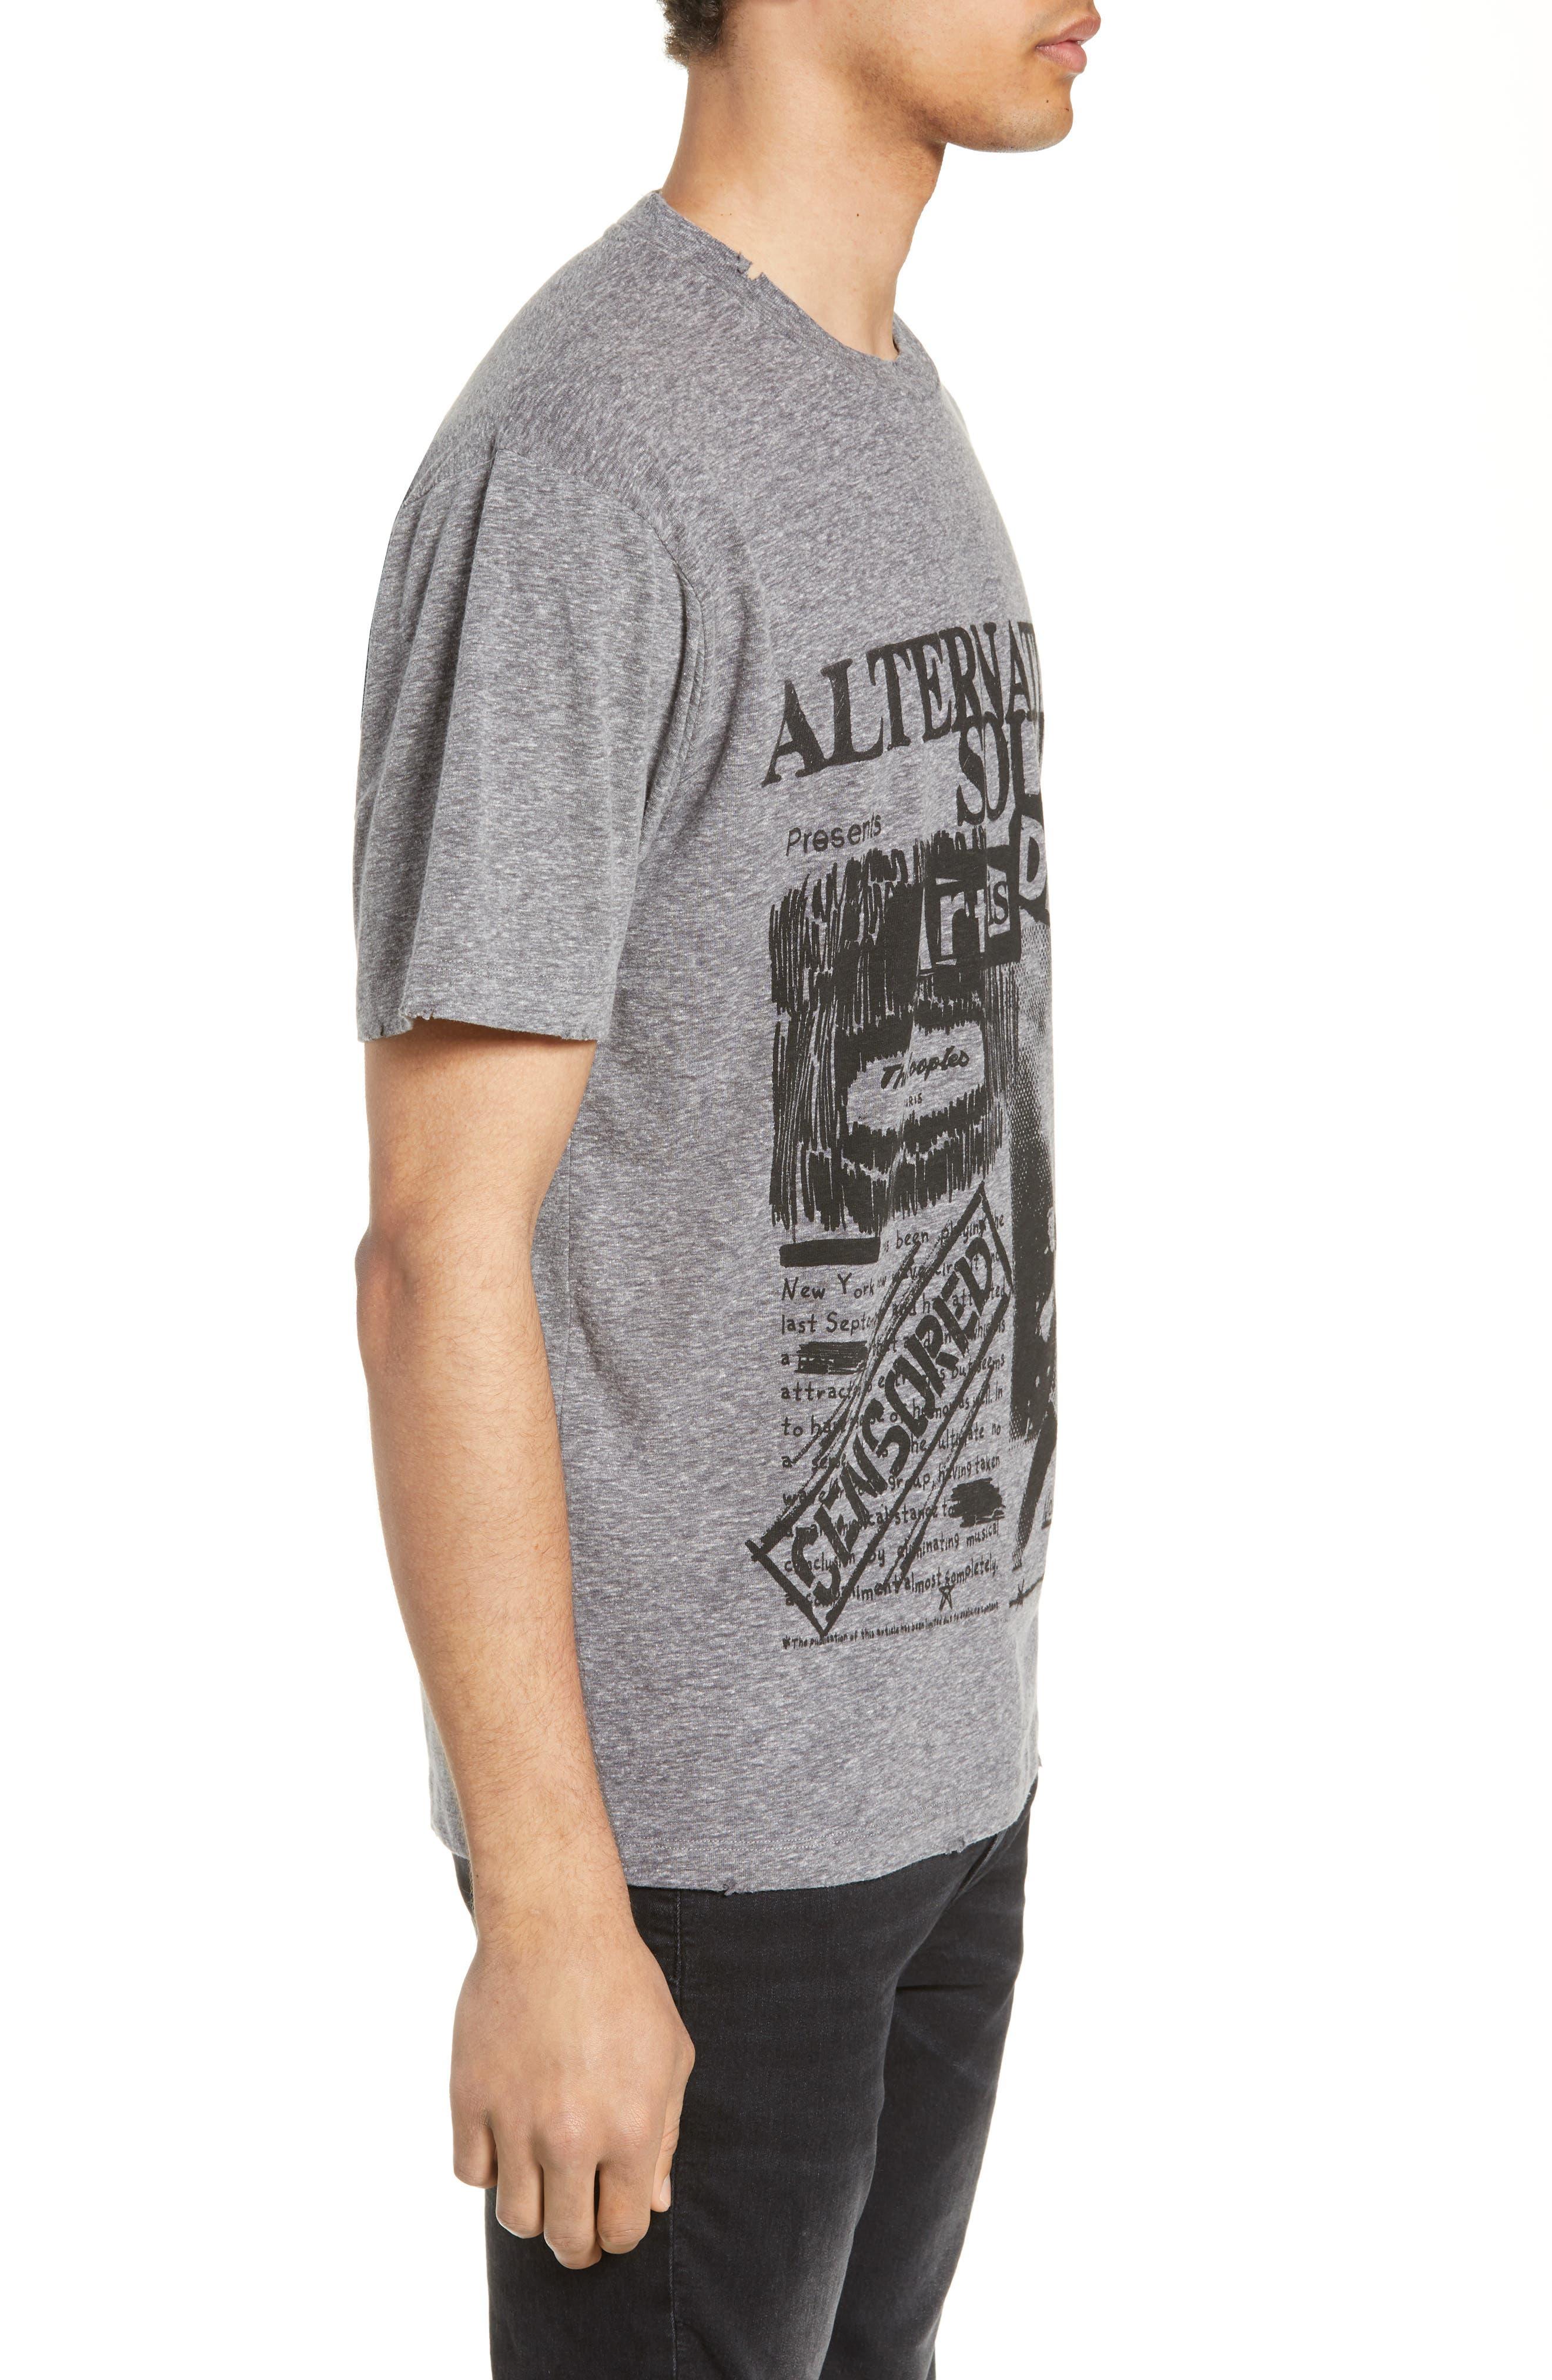 THE KOOPLES, Alternative Sounds Graphic T-Shirt, Alternate thumbnail 3, color, GREY